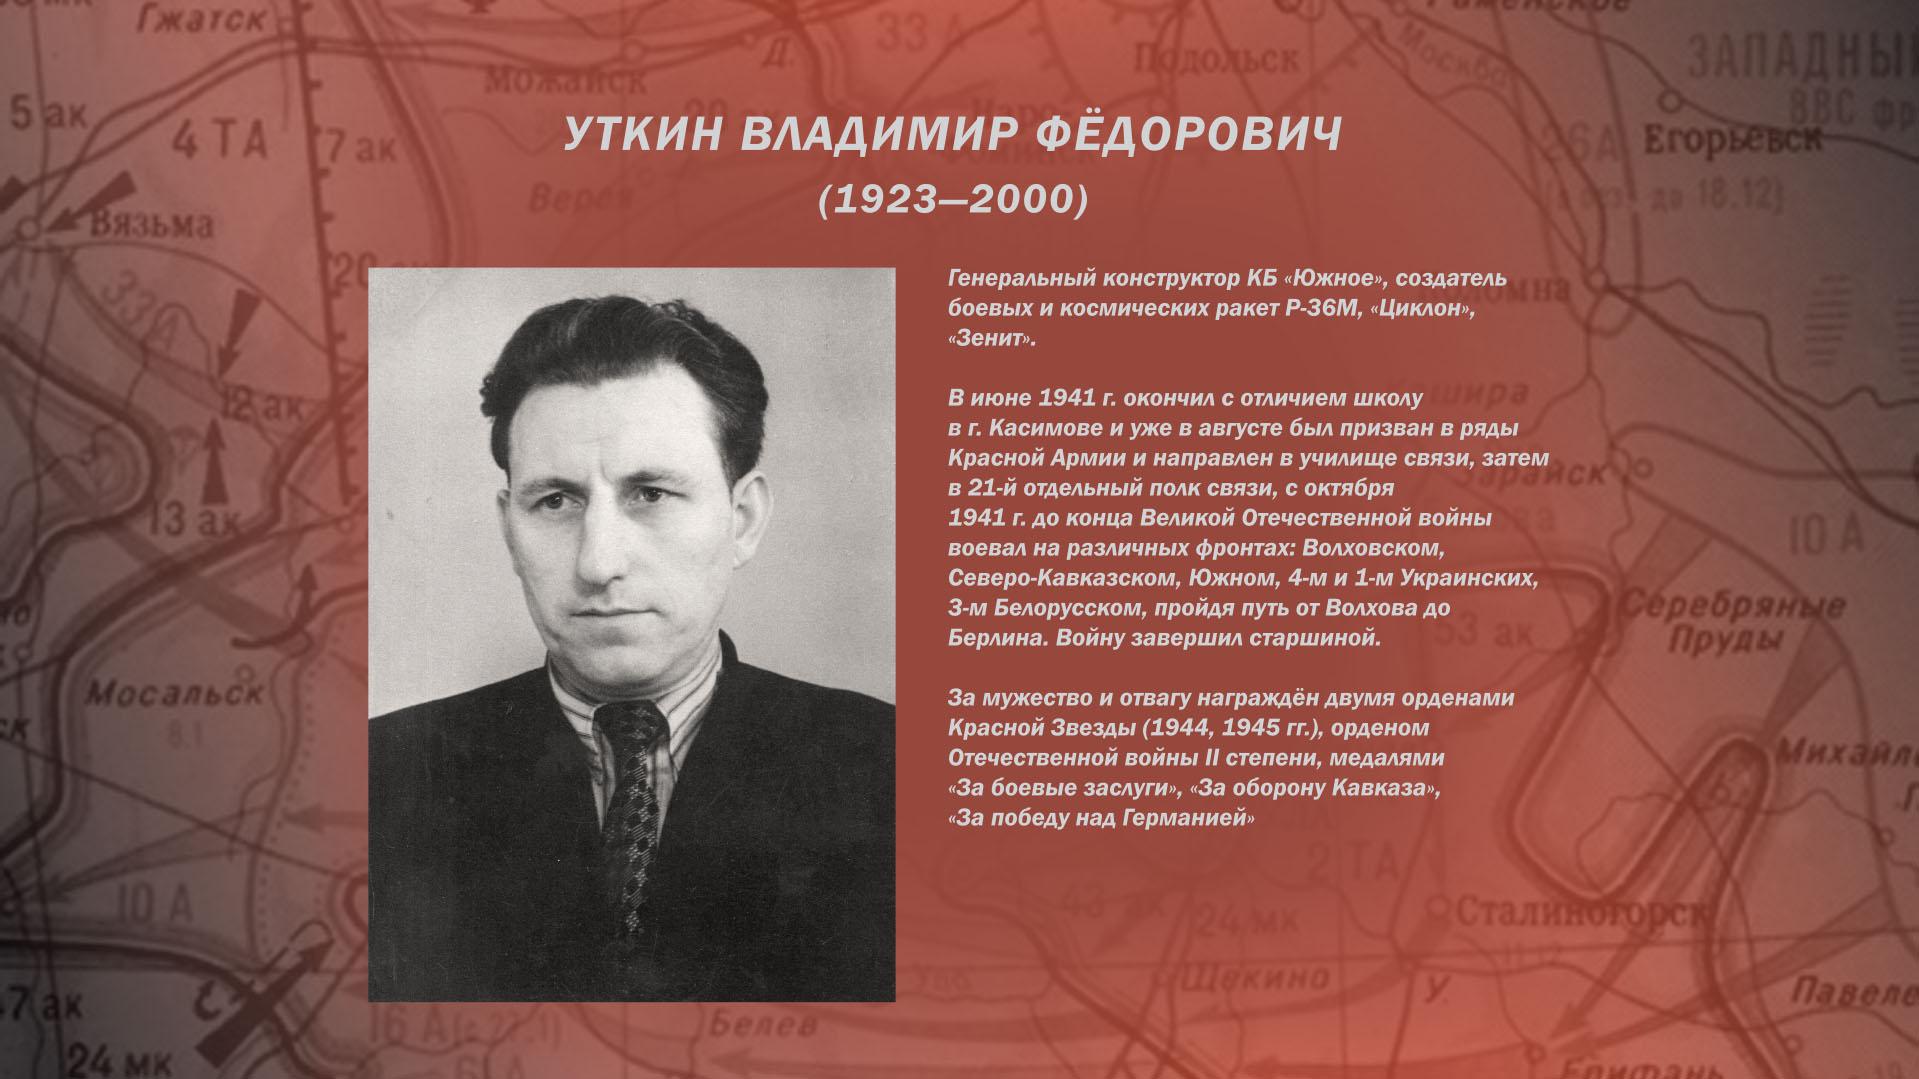 Уткин Владимир Федорович